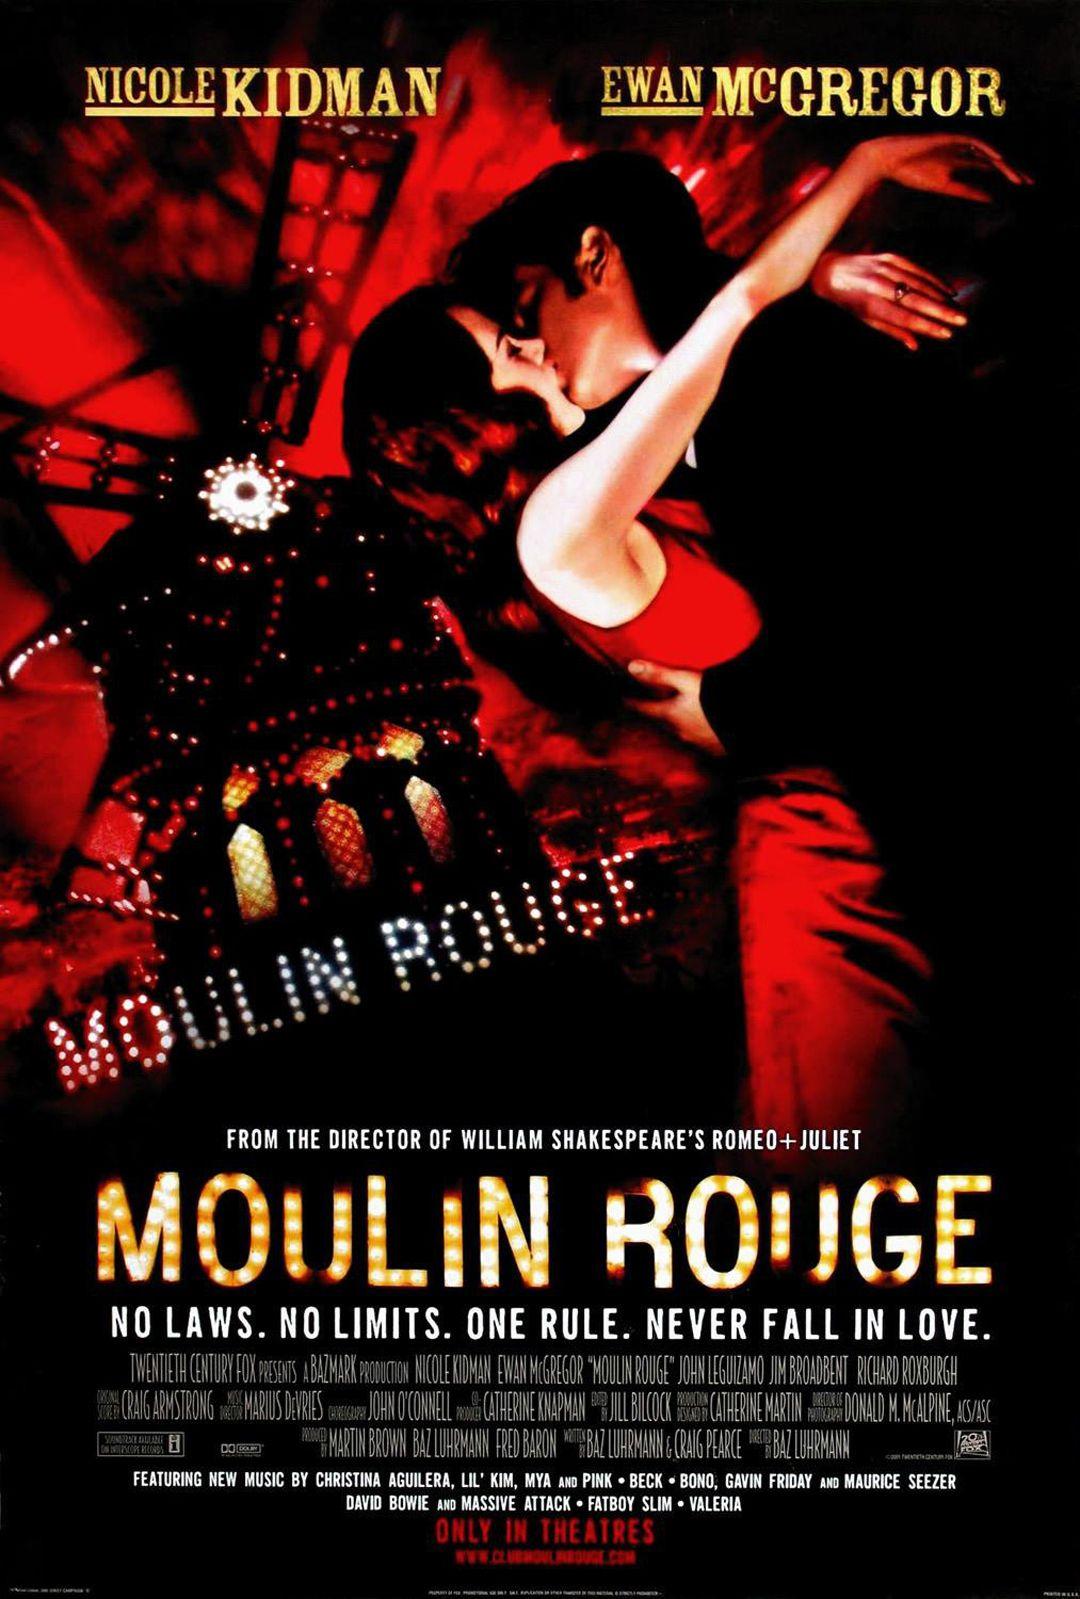 Watch Nicole Kidman Ewan Mcgregor S Mini Moulin Rouge